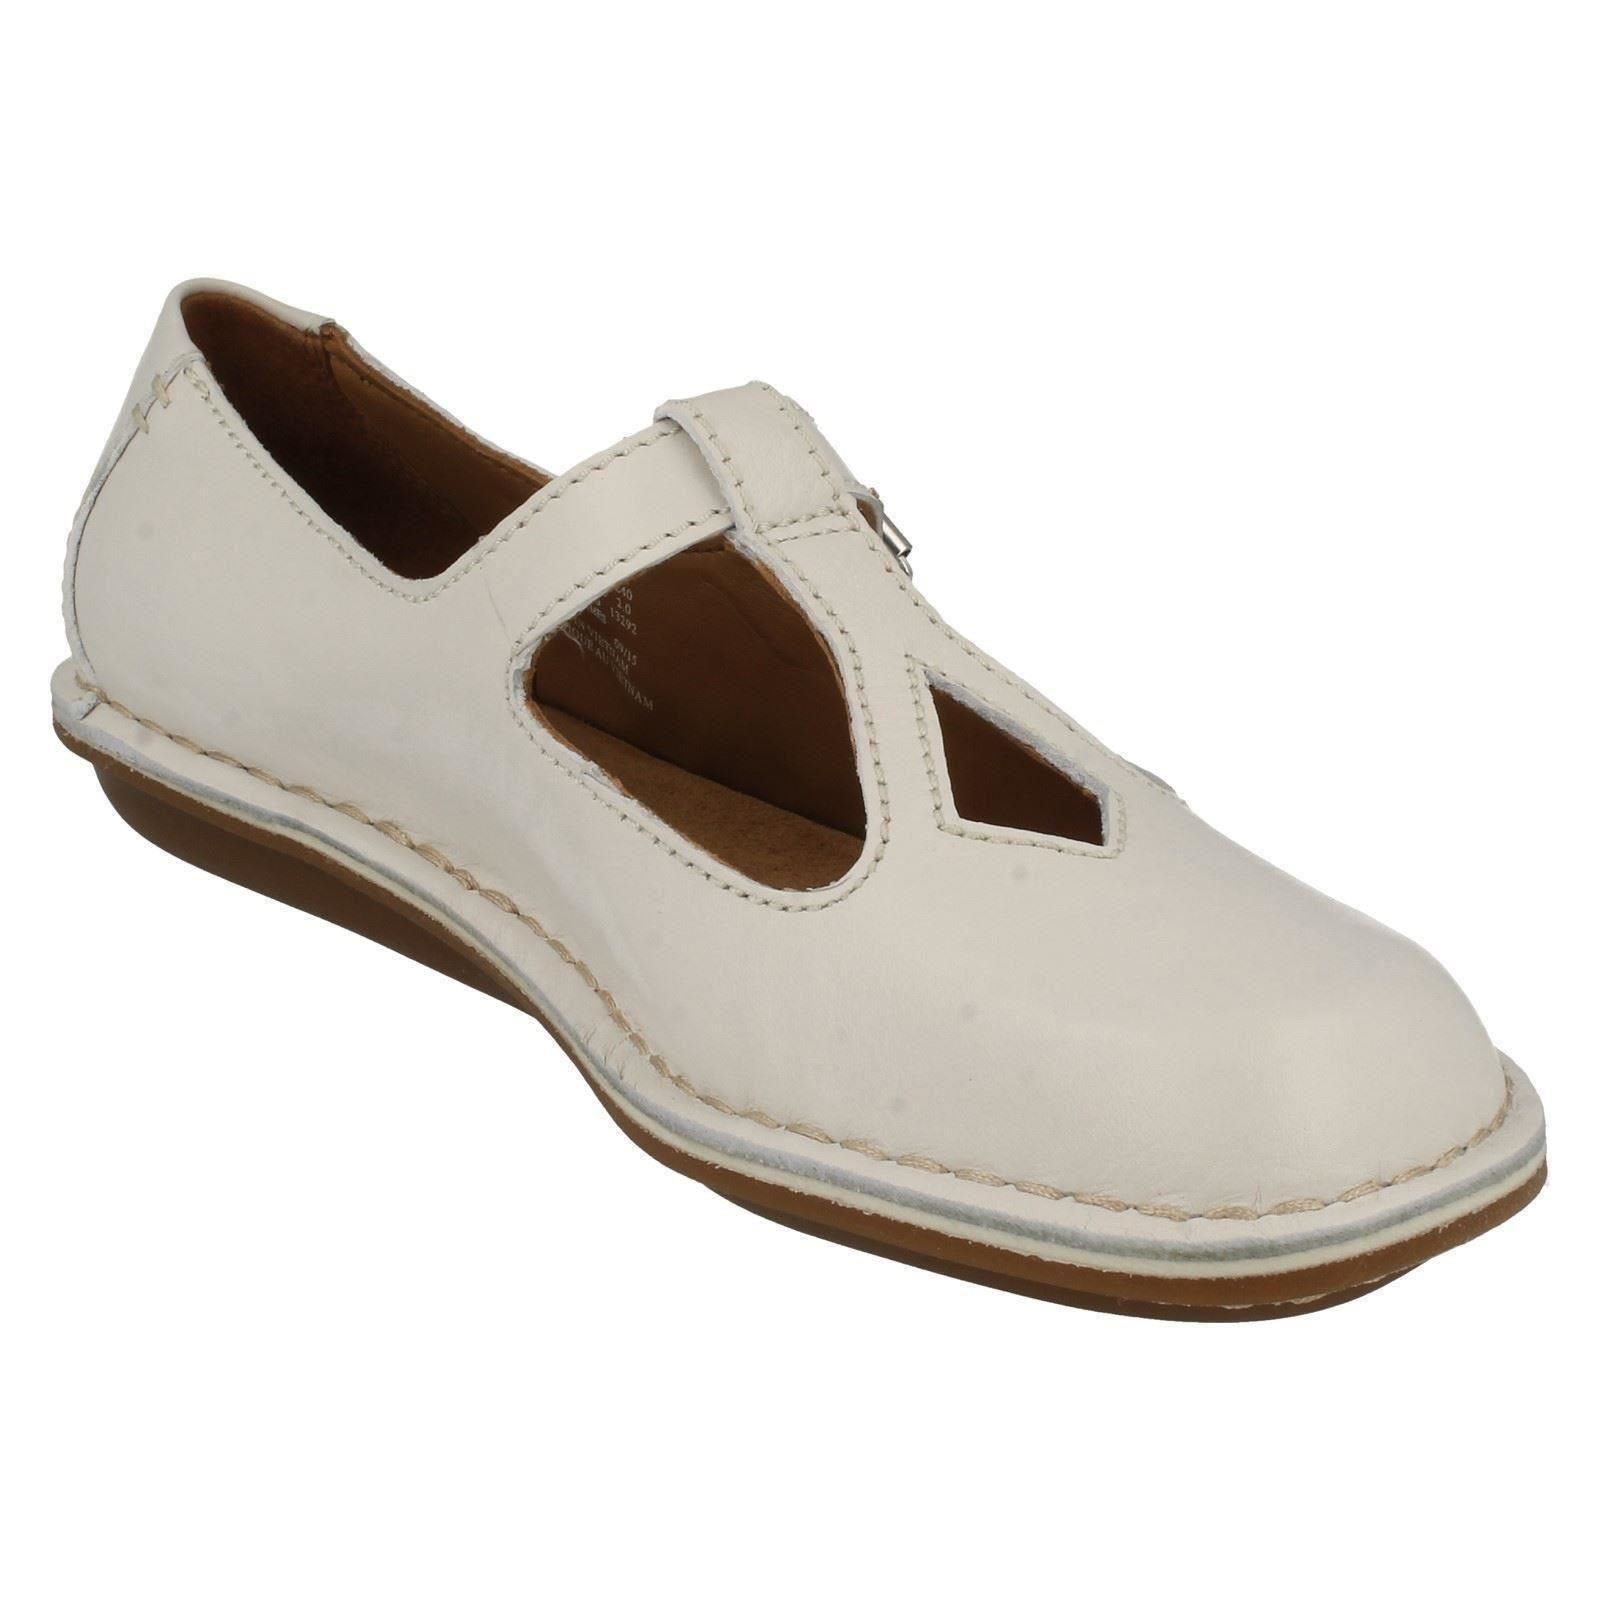 392a5de6331a Ladies-Clarks-T-Bar-Flat-Shoes-Tustin-Talent thumbnail